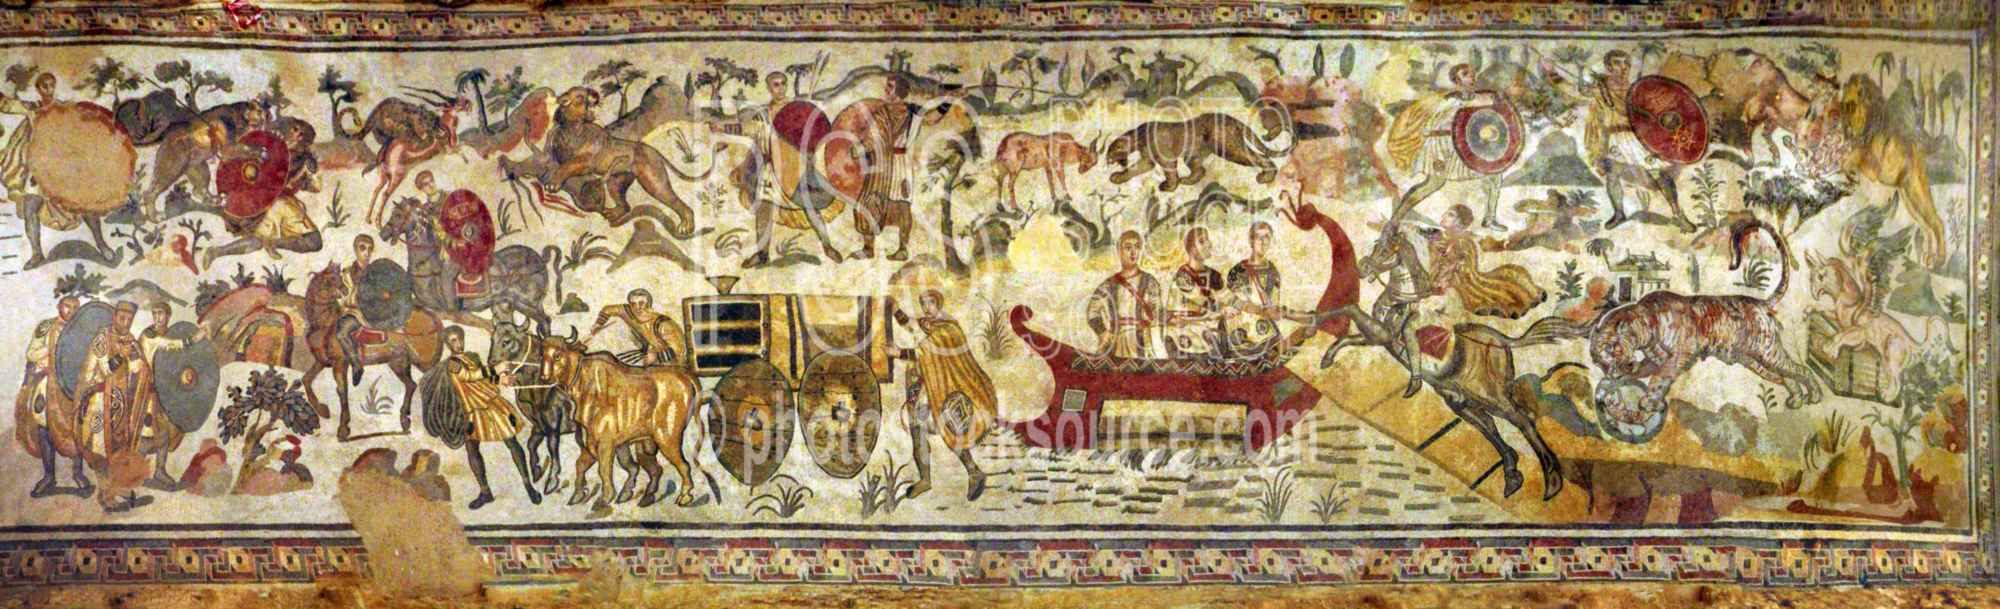 Great Hunting Scene Mosaic